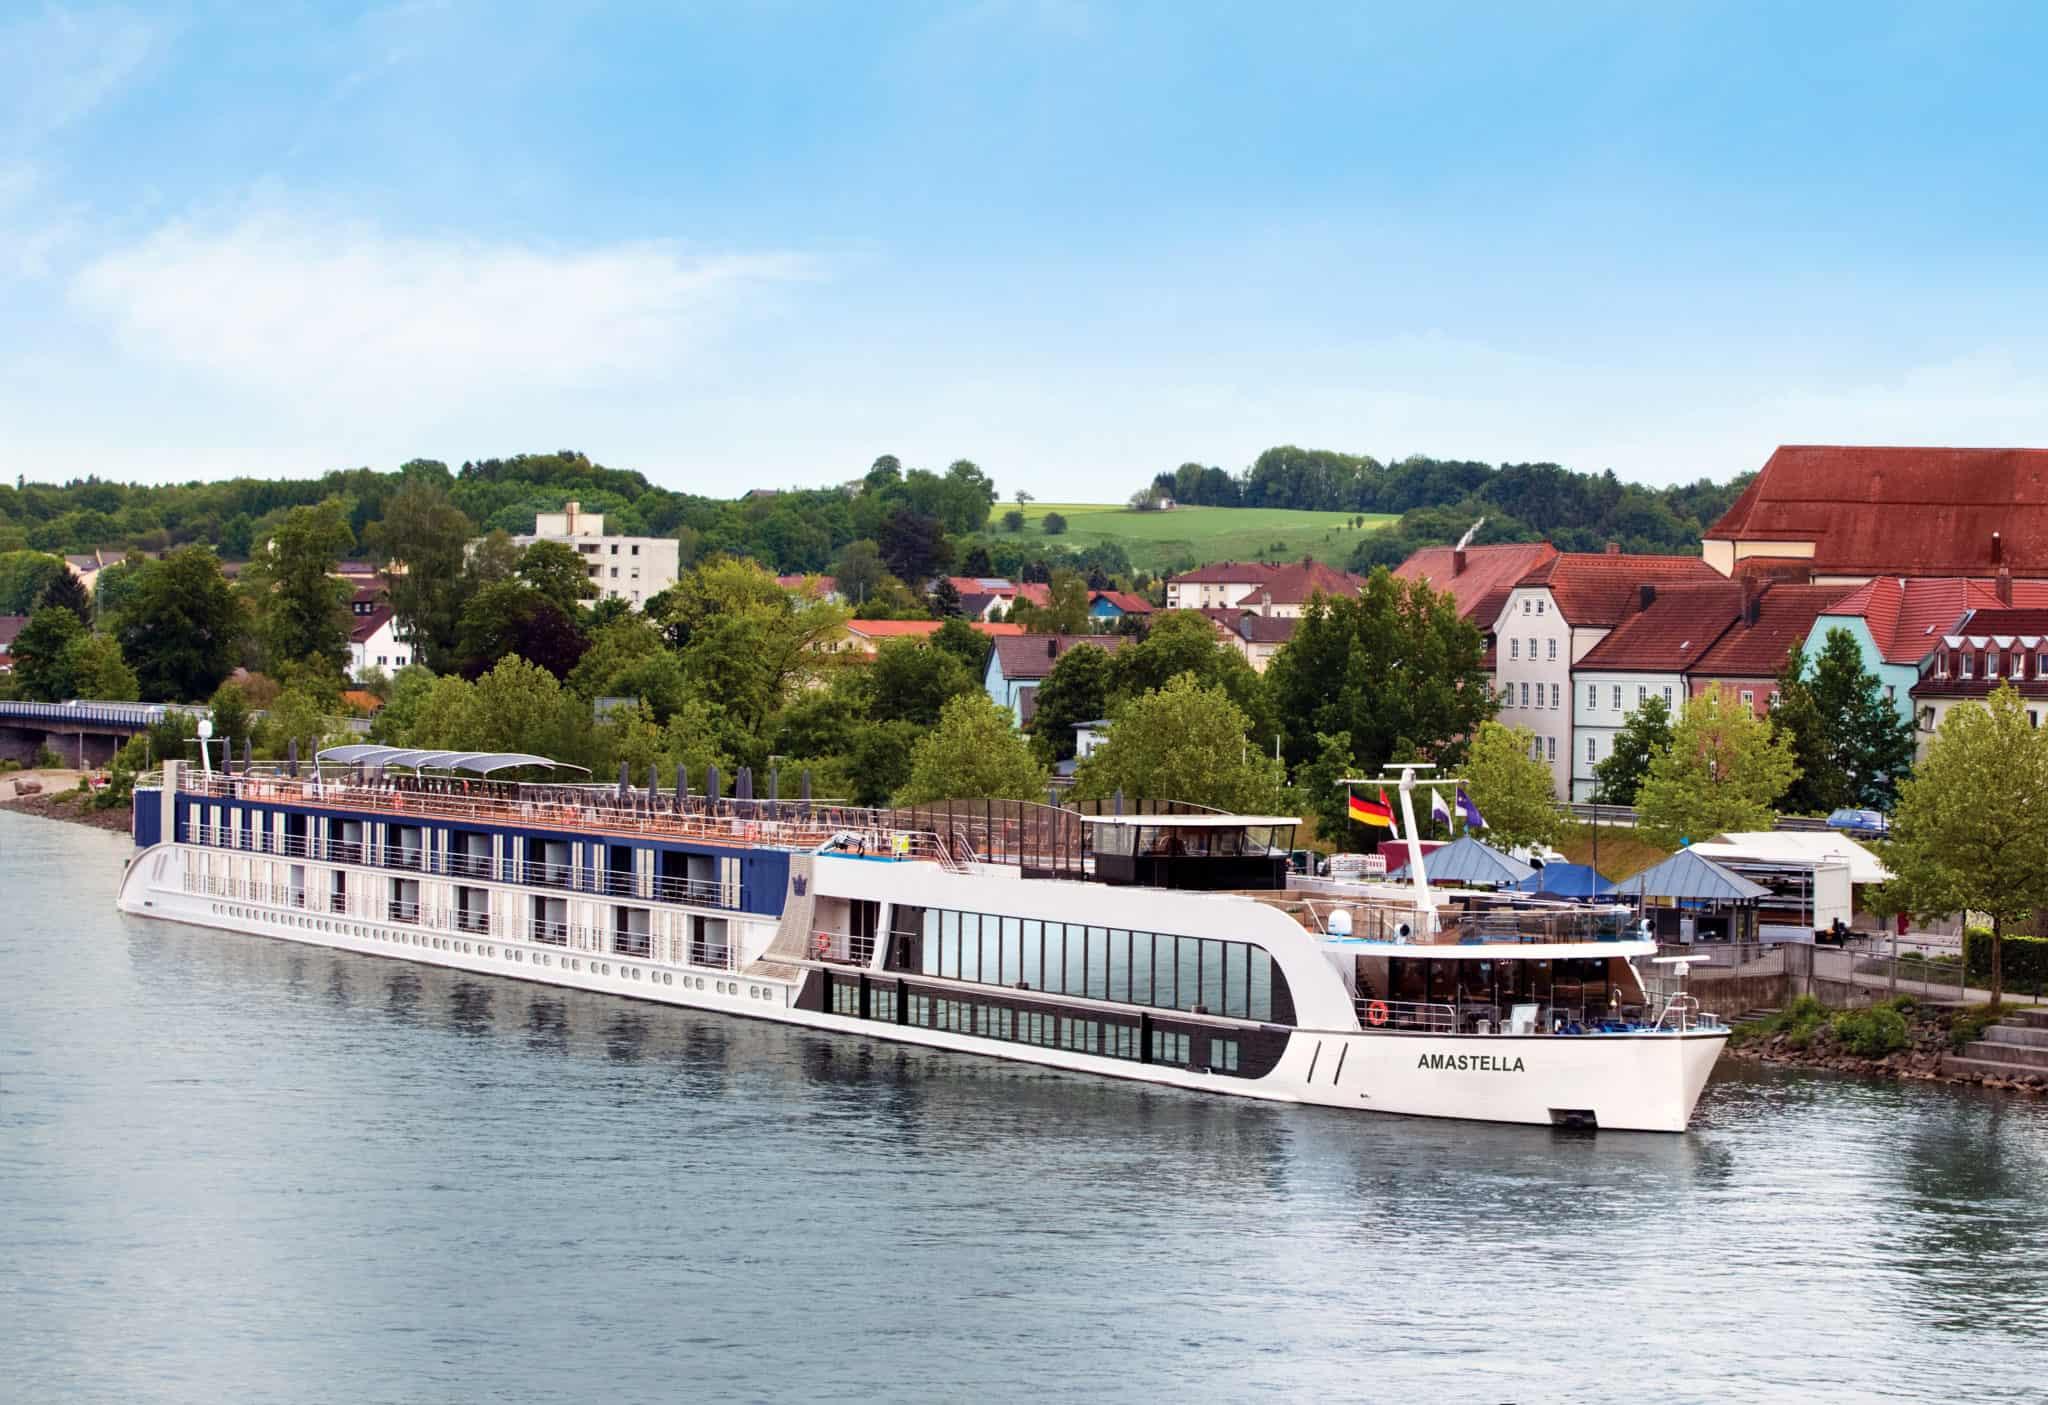 amastella amawaterways vilshofen germany river ship